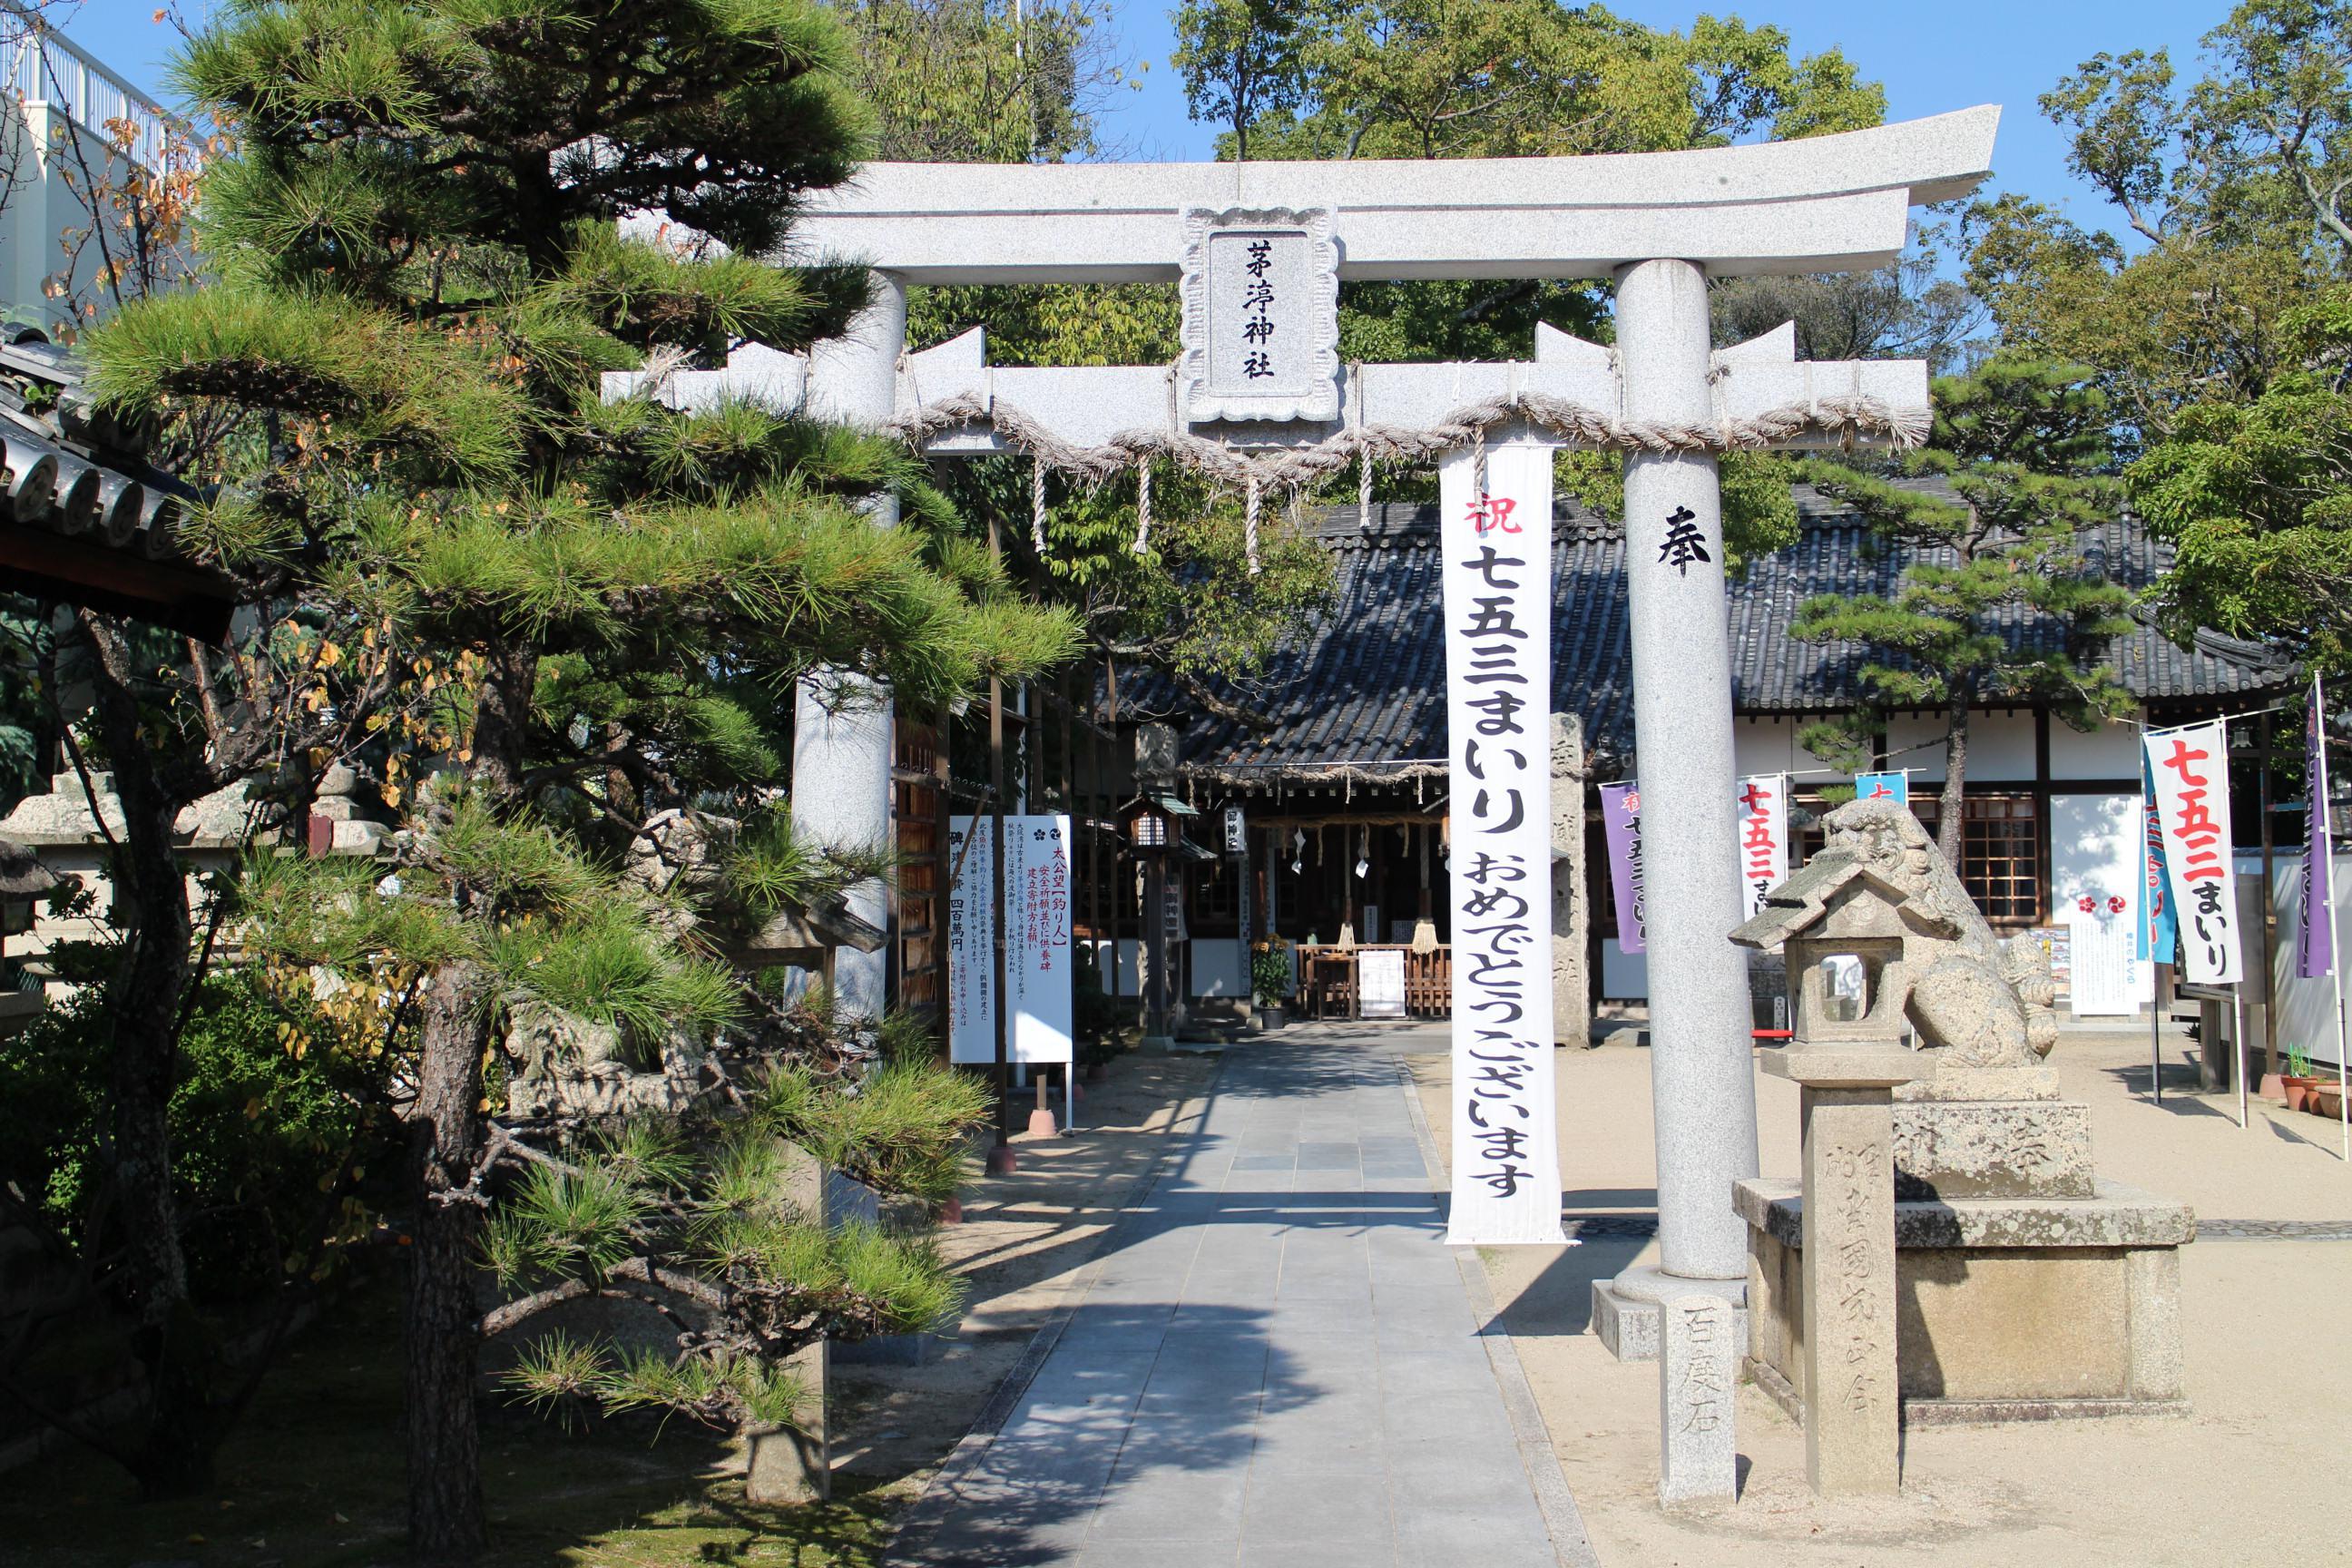 茅渟神社の鳥居